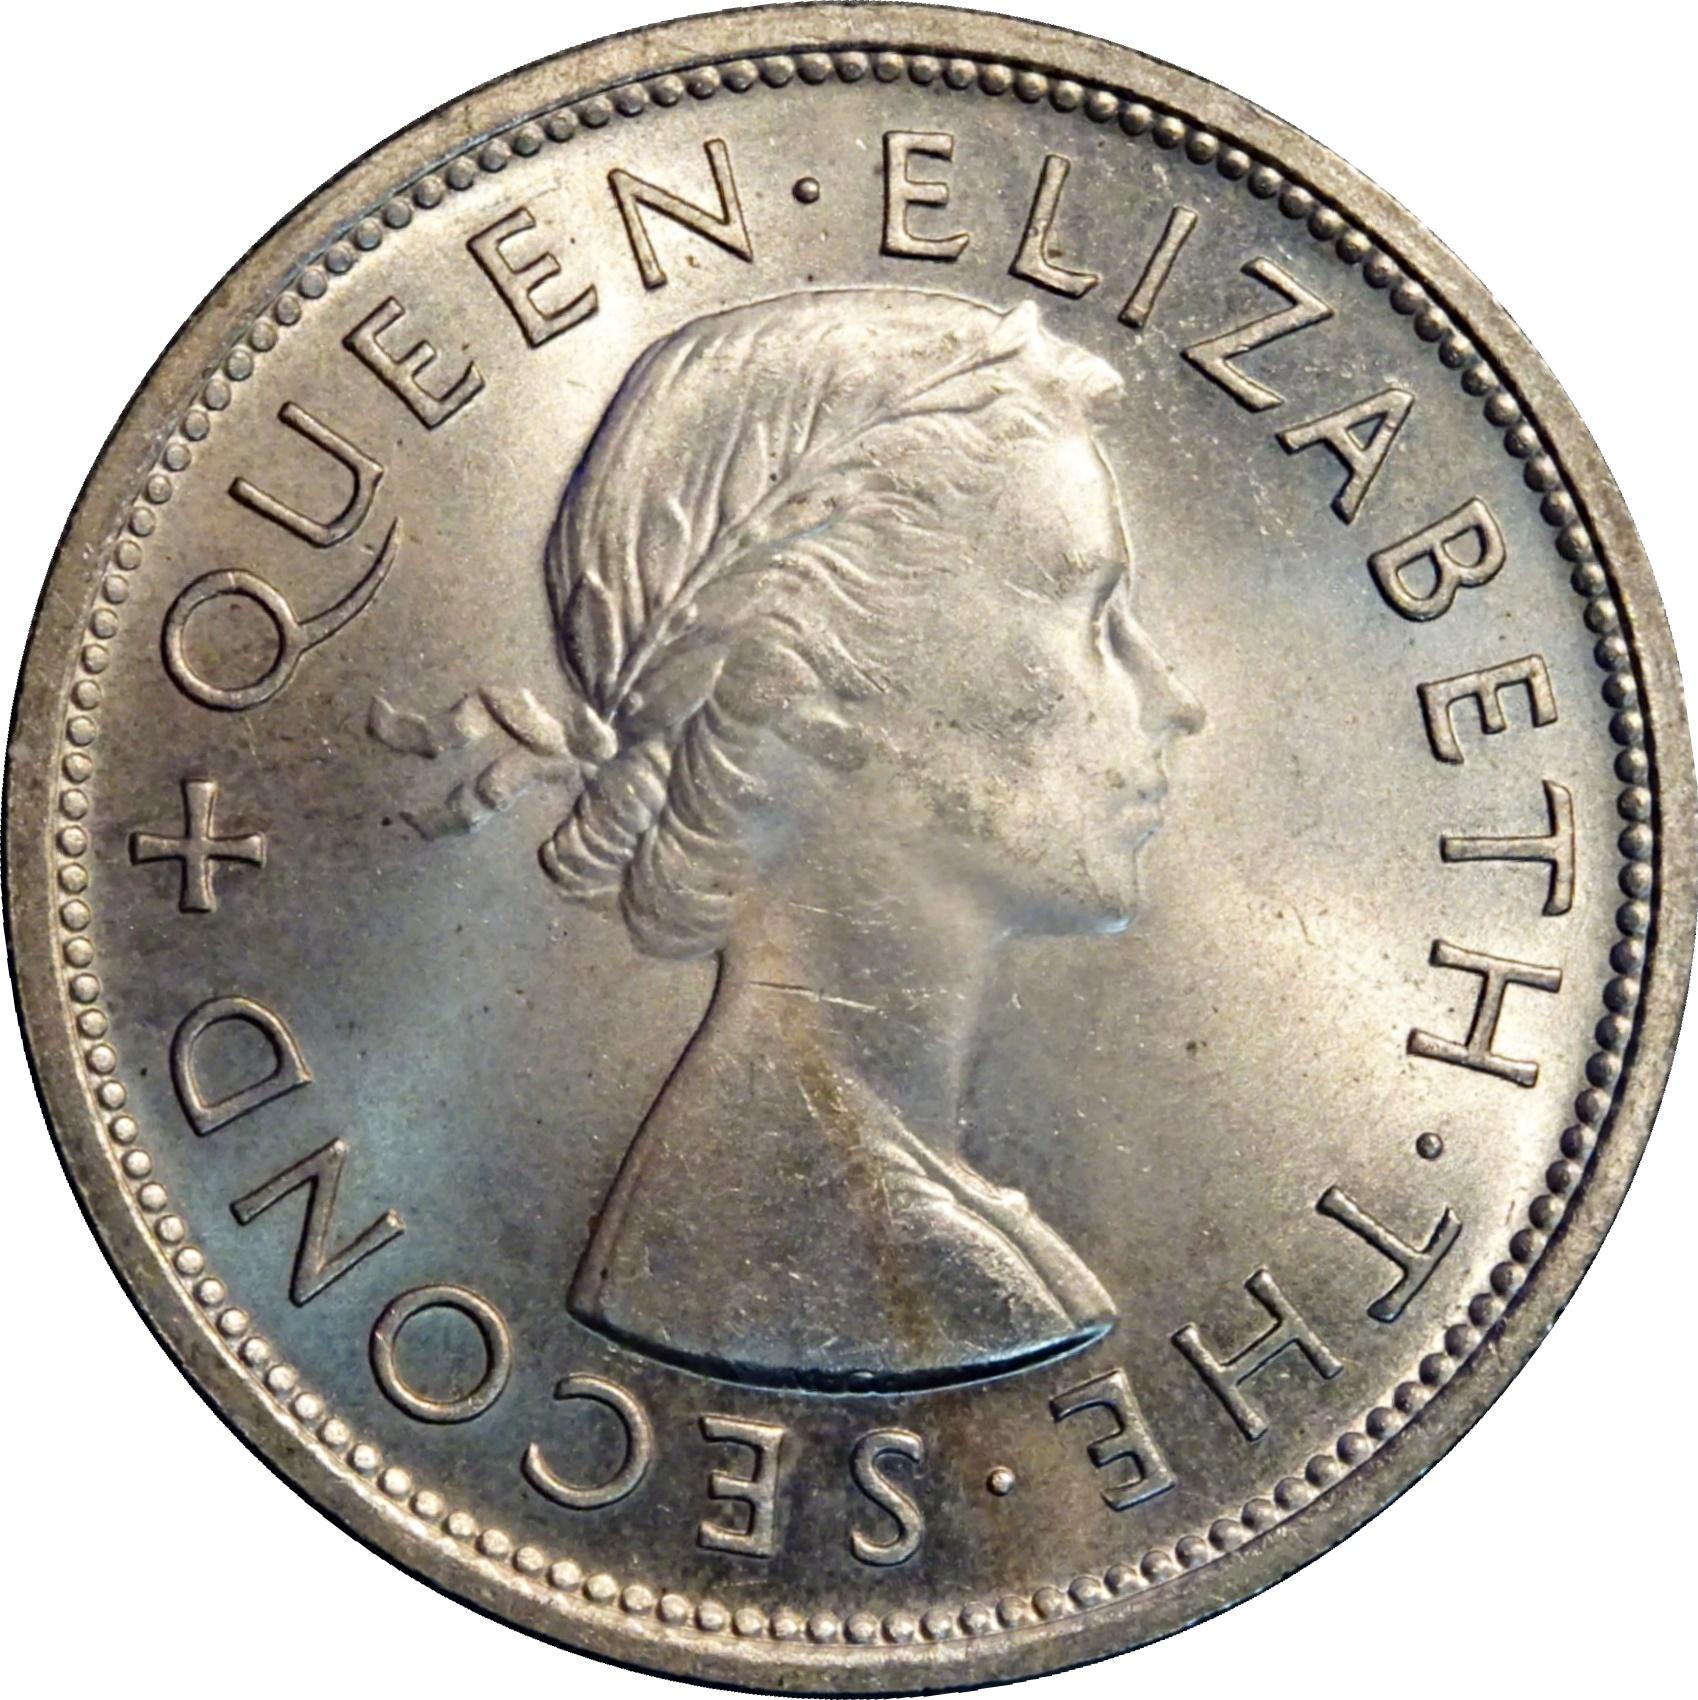 Coronation Coin New Zealand 1953 Crown 5